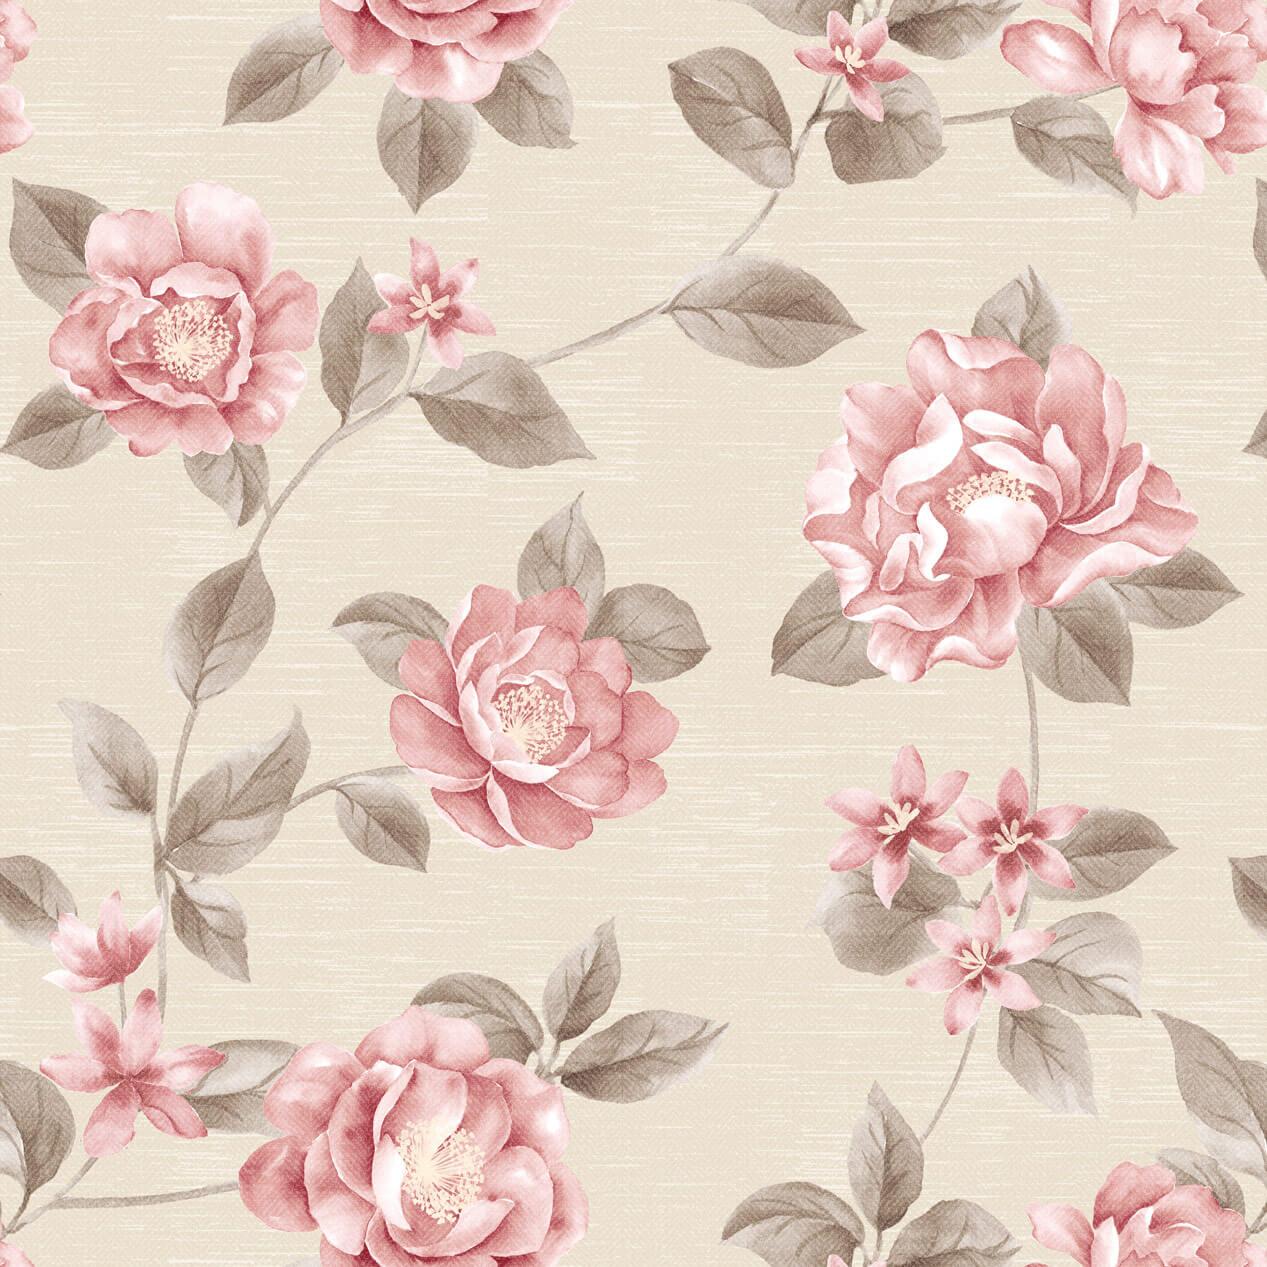 Papel de Parede Floral Rosa Pintada Fundo Bege